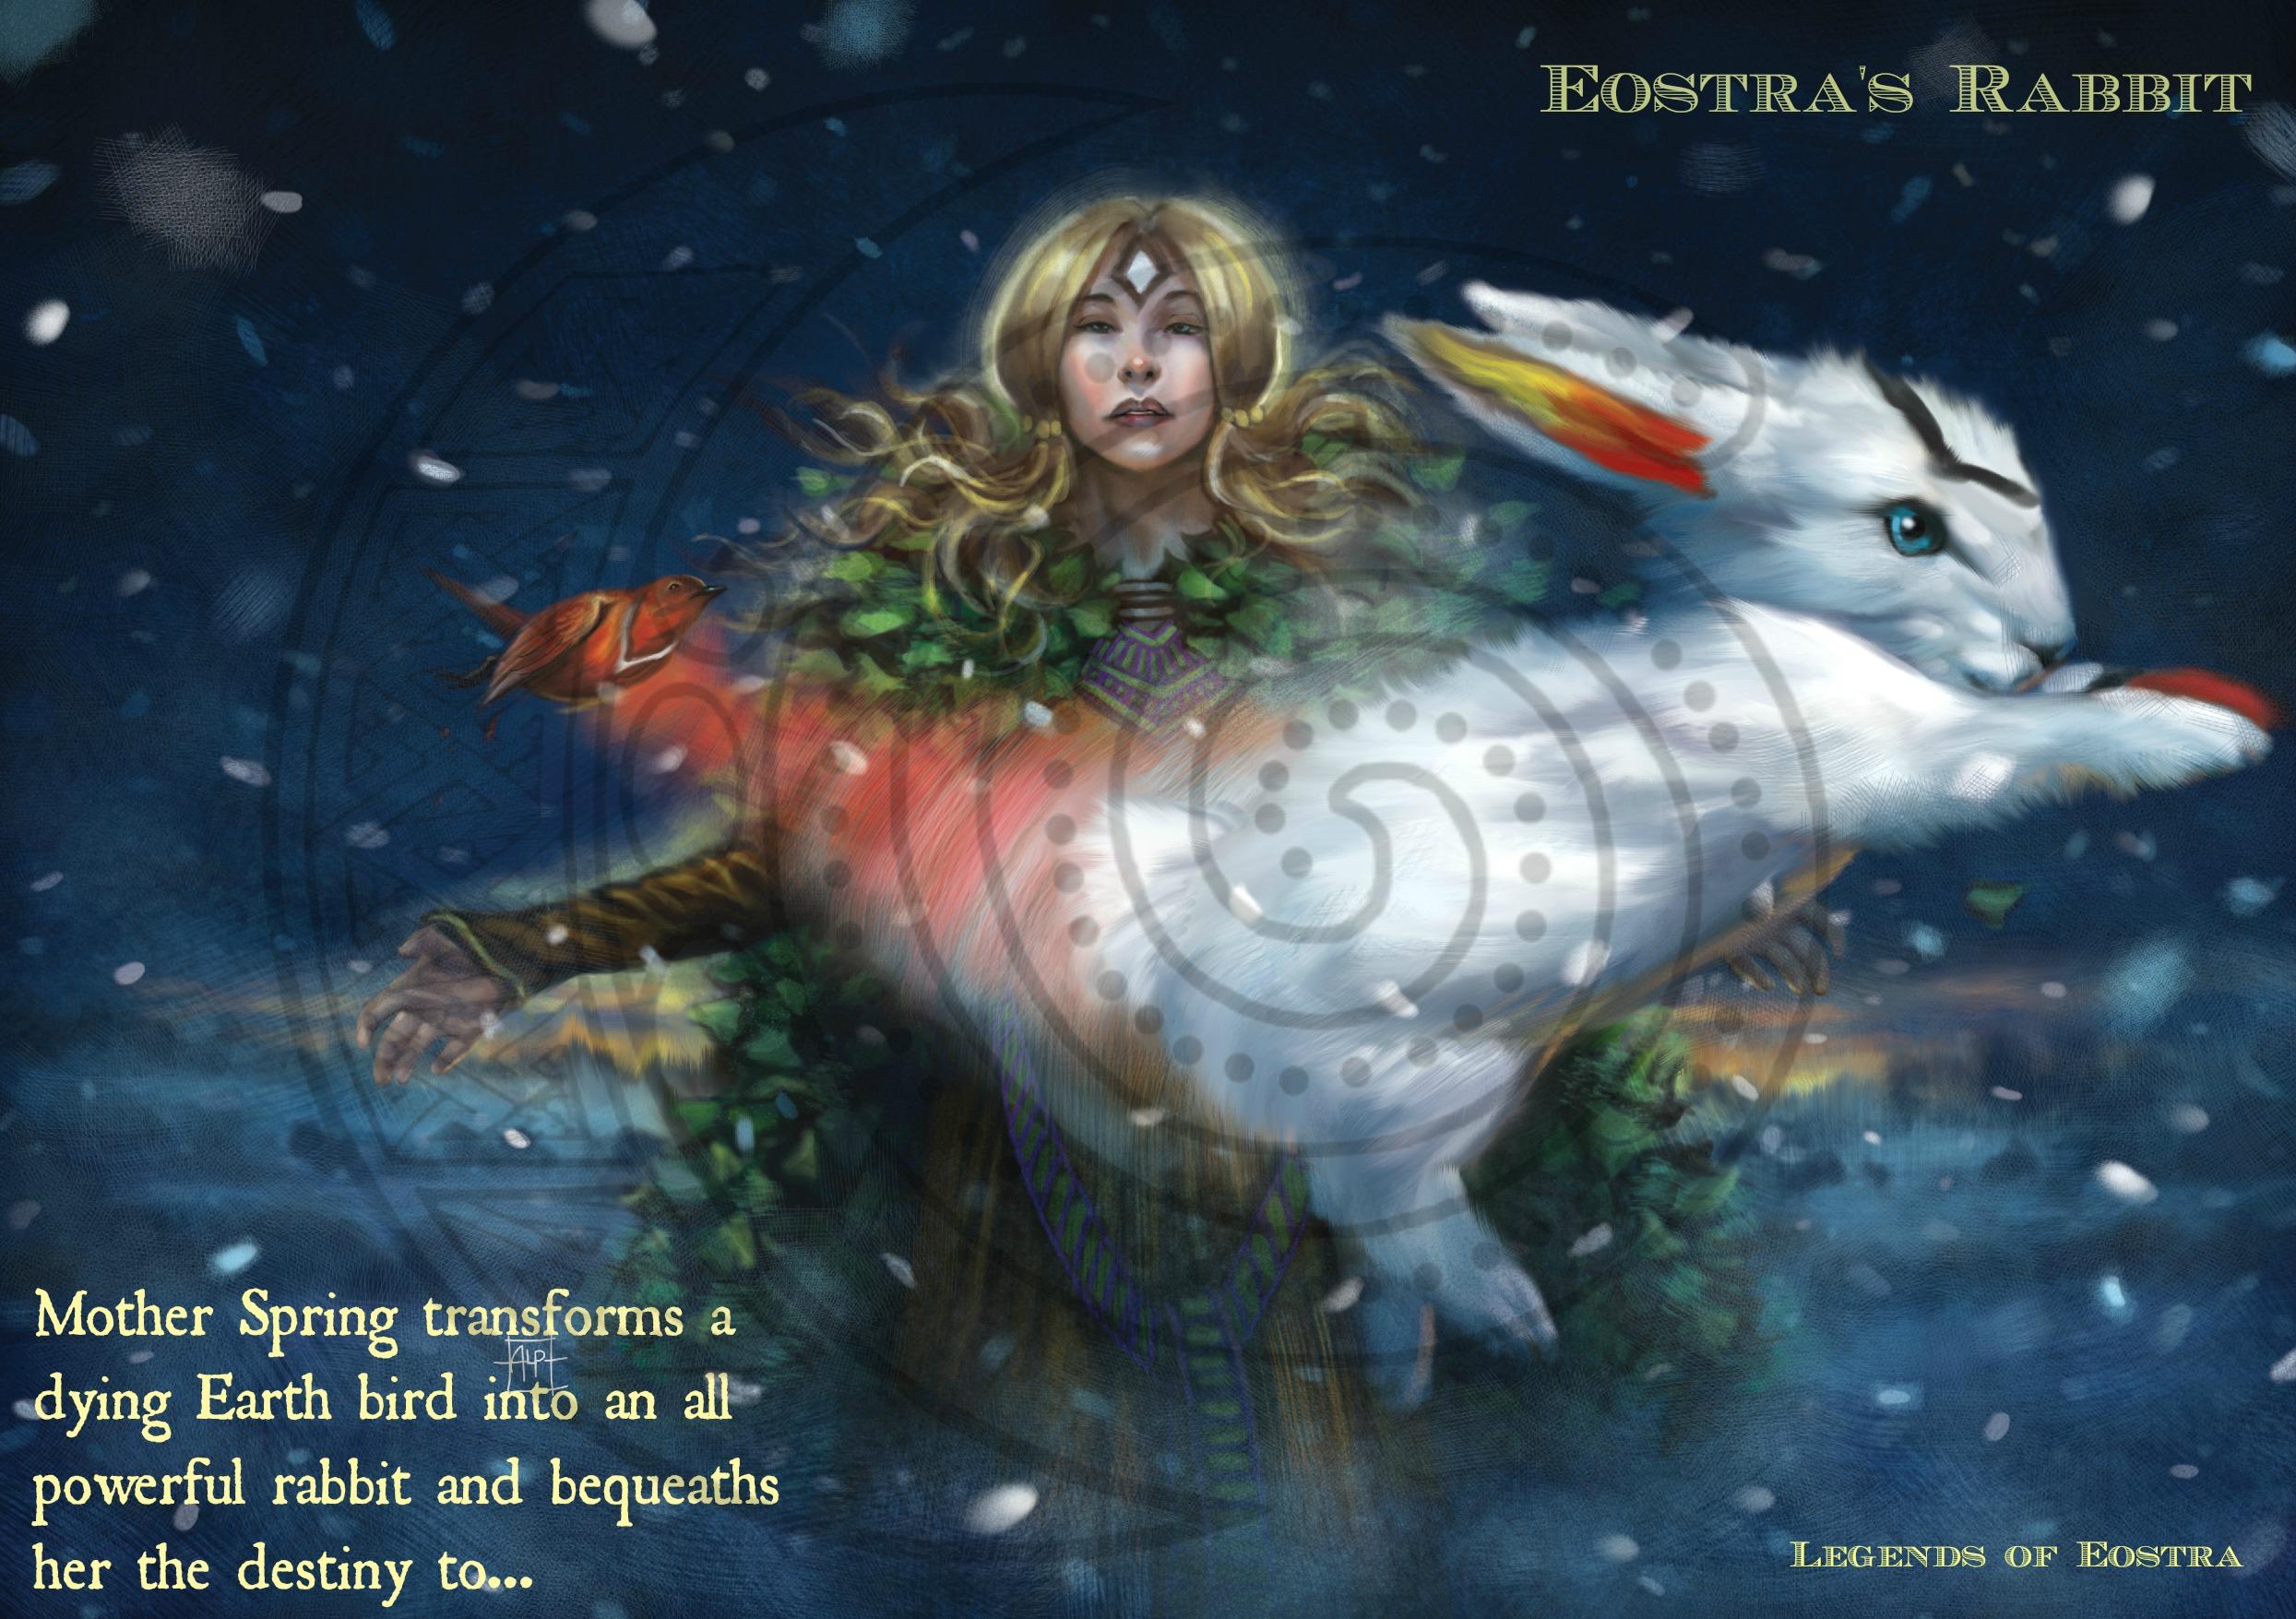 Eostra's Rabbit transformation